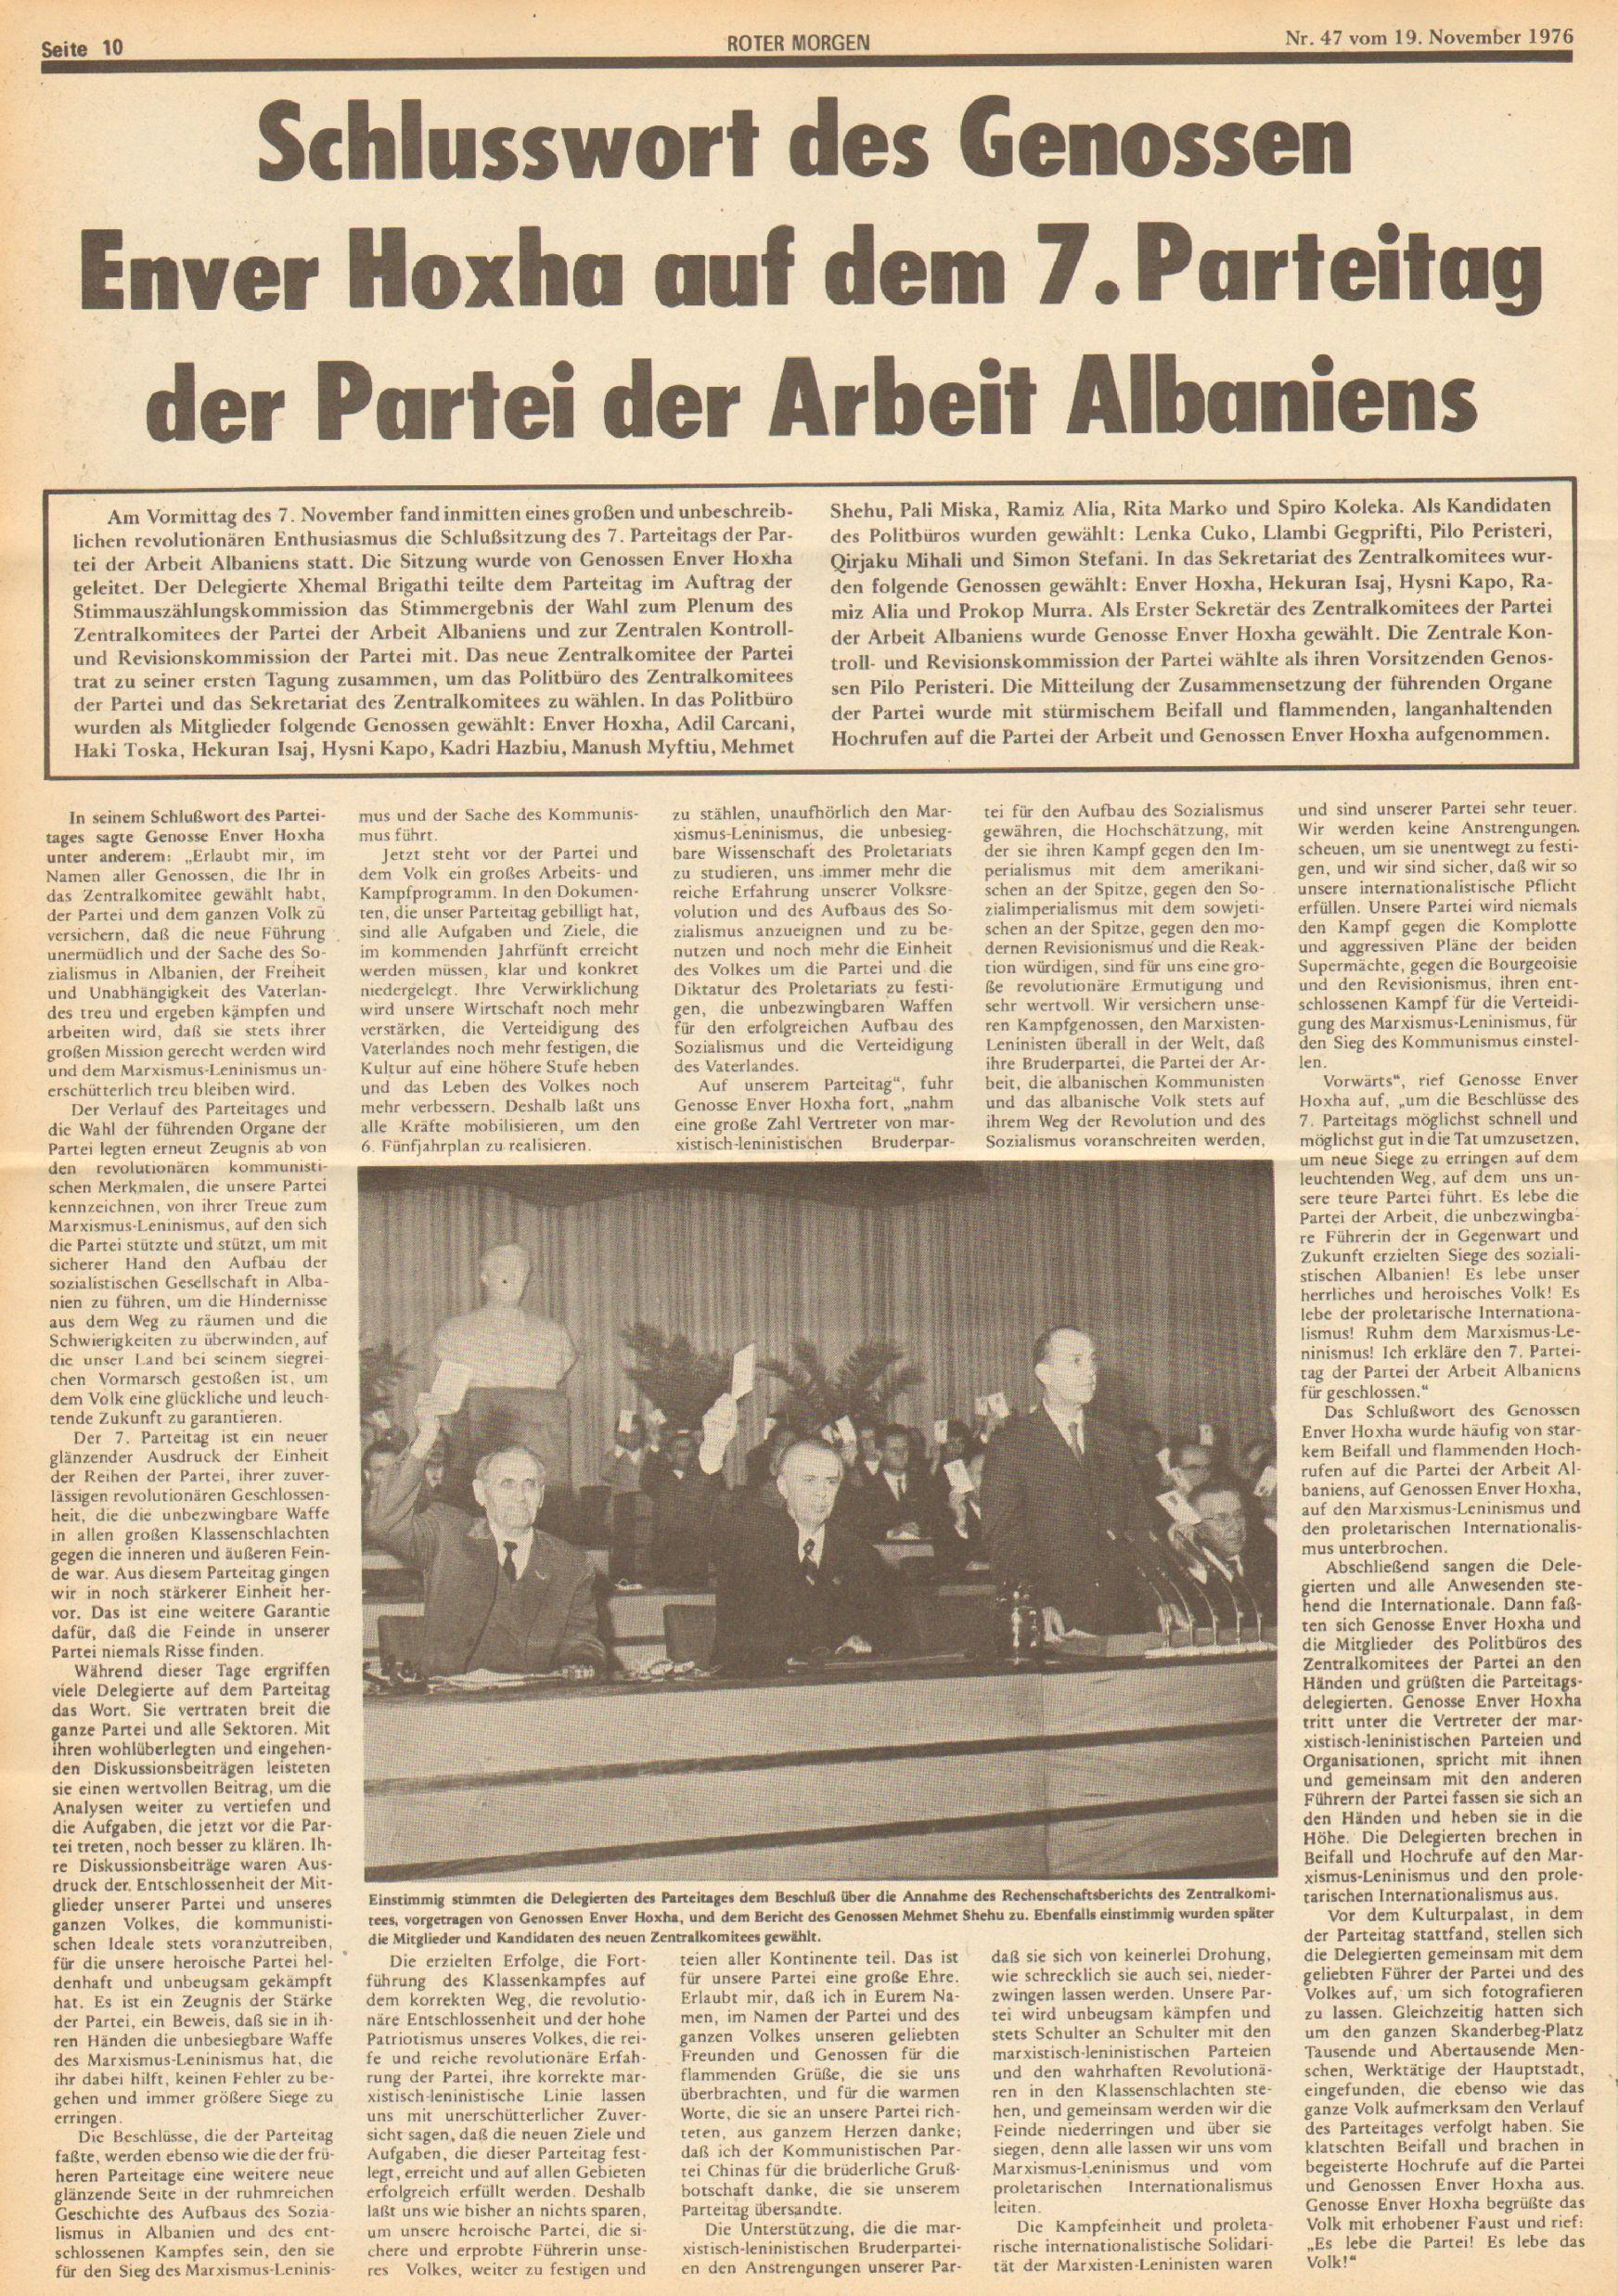 Roter Morgen, 10. Jg., 19. November 1976, Nr. 47, Seite 10